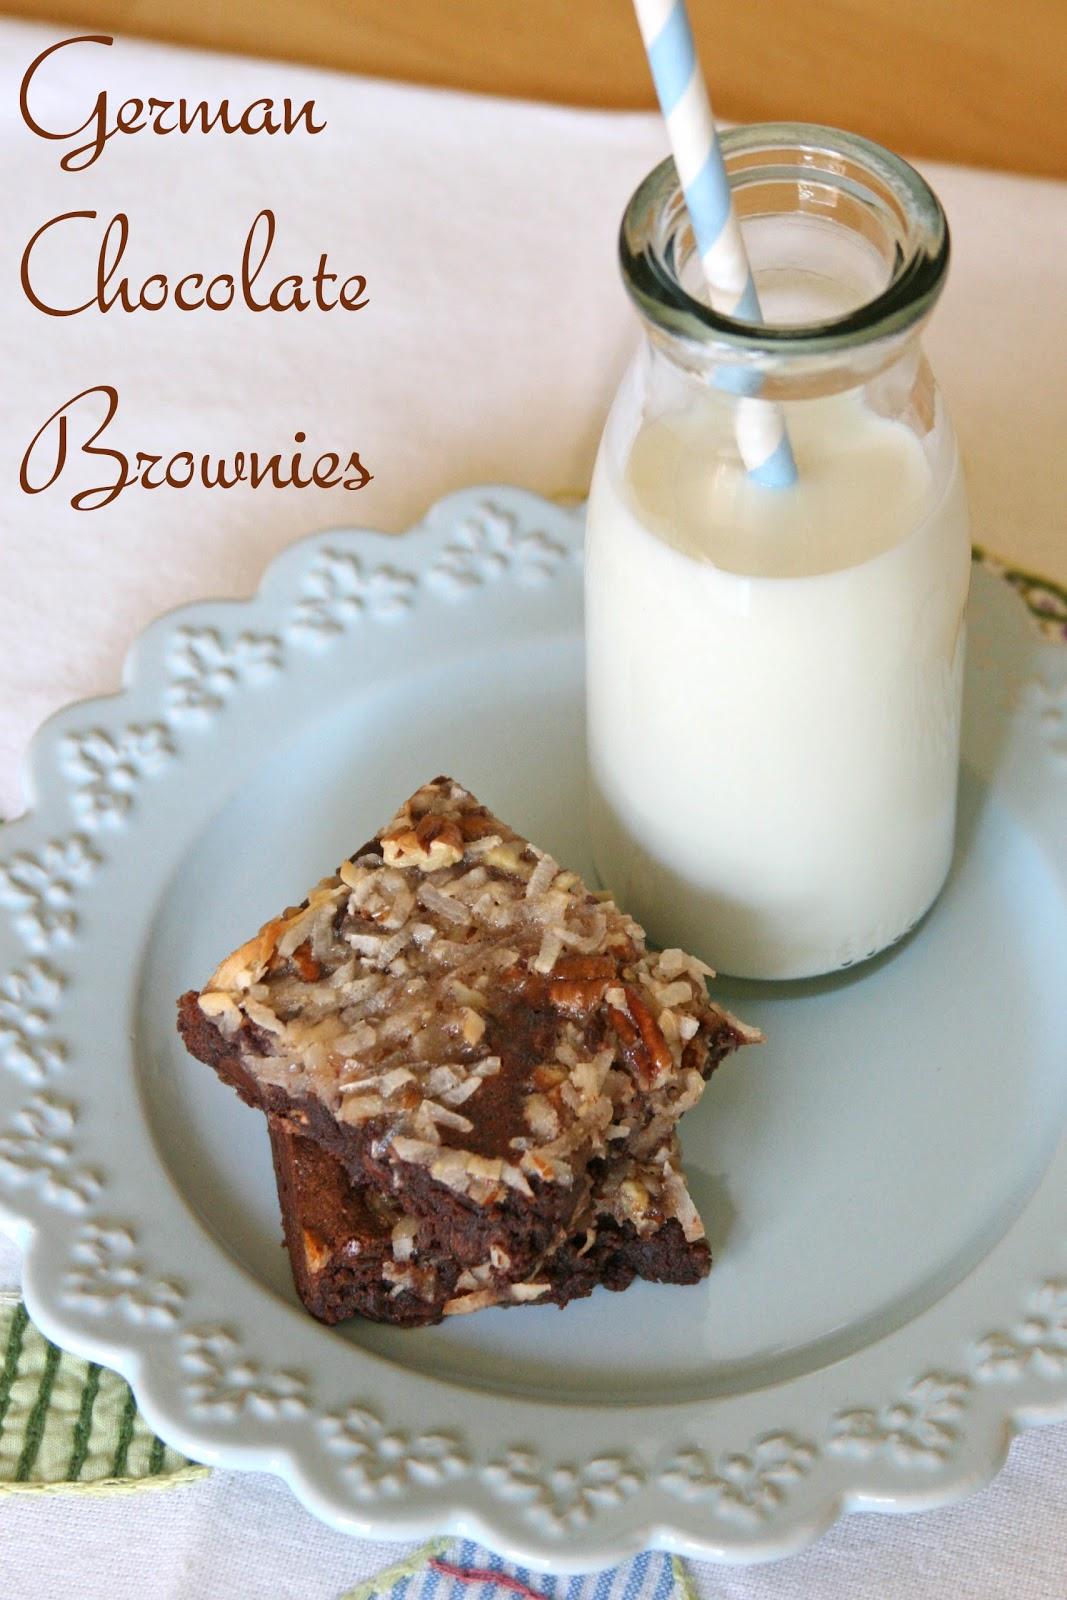 German Chocolate Brownies – Glorious Treats